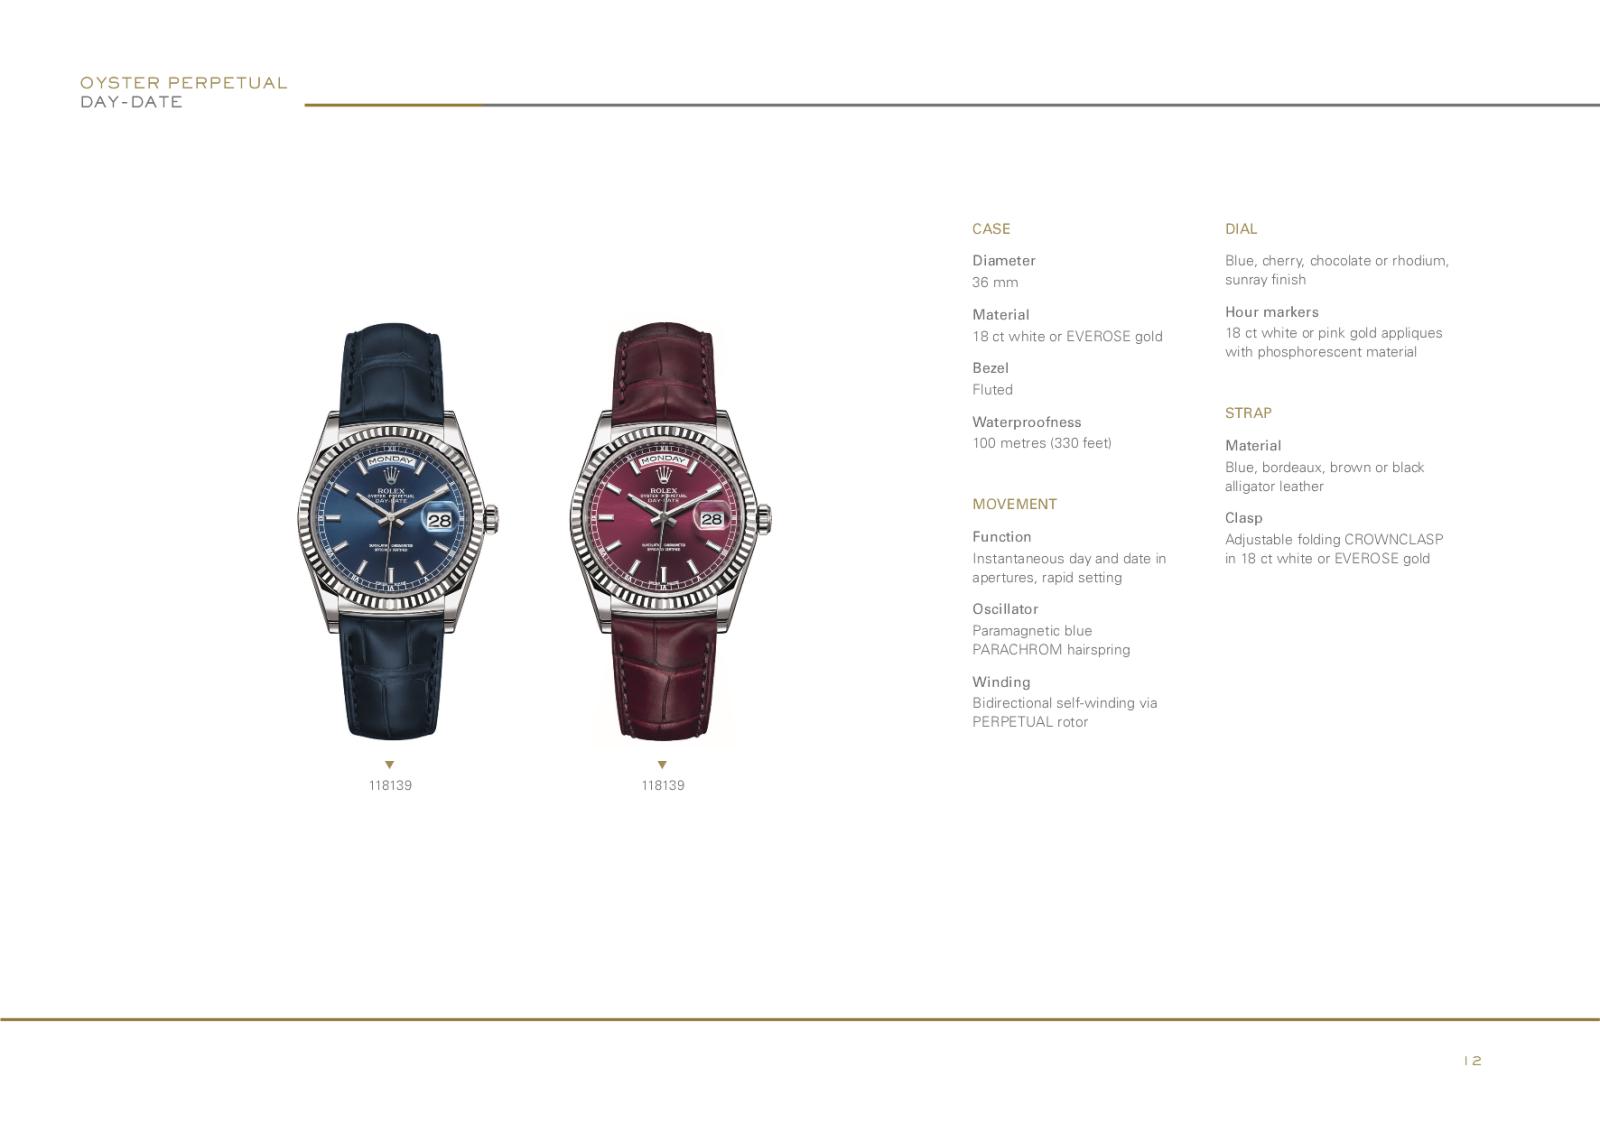 Baselworld 2013: Rolex 30mb7n9